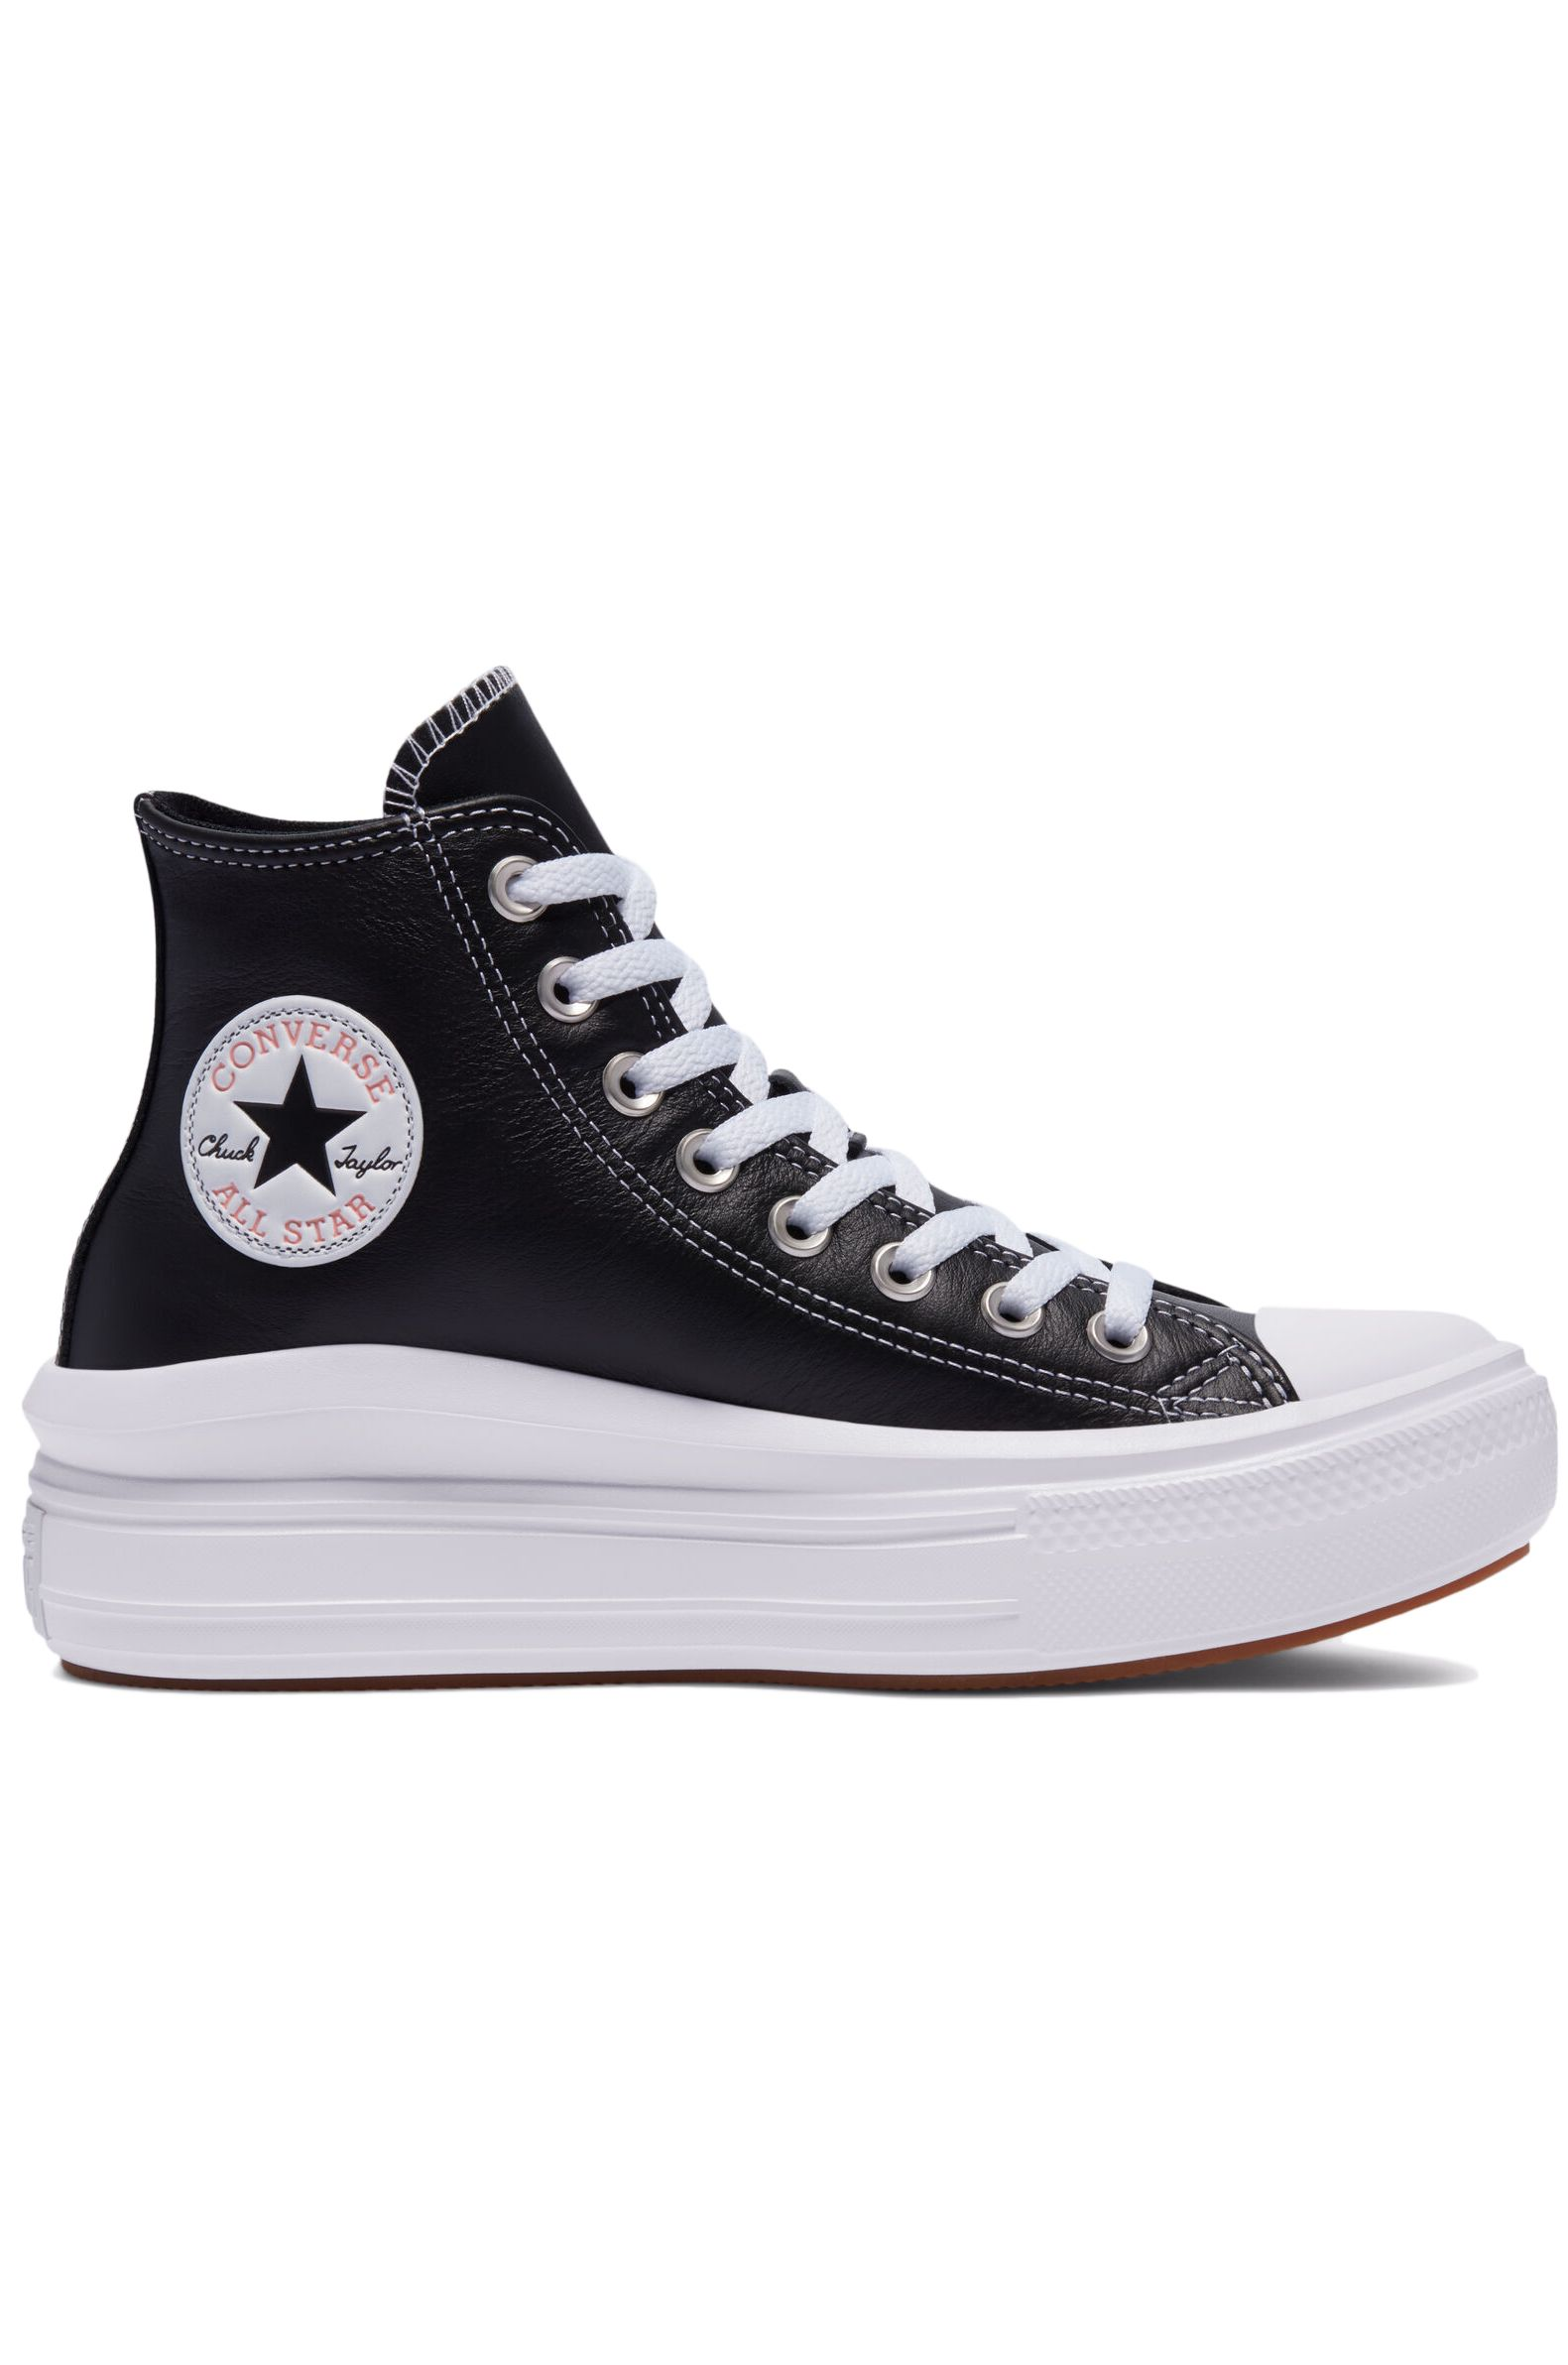 Converse Shoes CHUCK TAYLOR ALL STAR MOVE HI Black/White/Pink Quartz